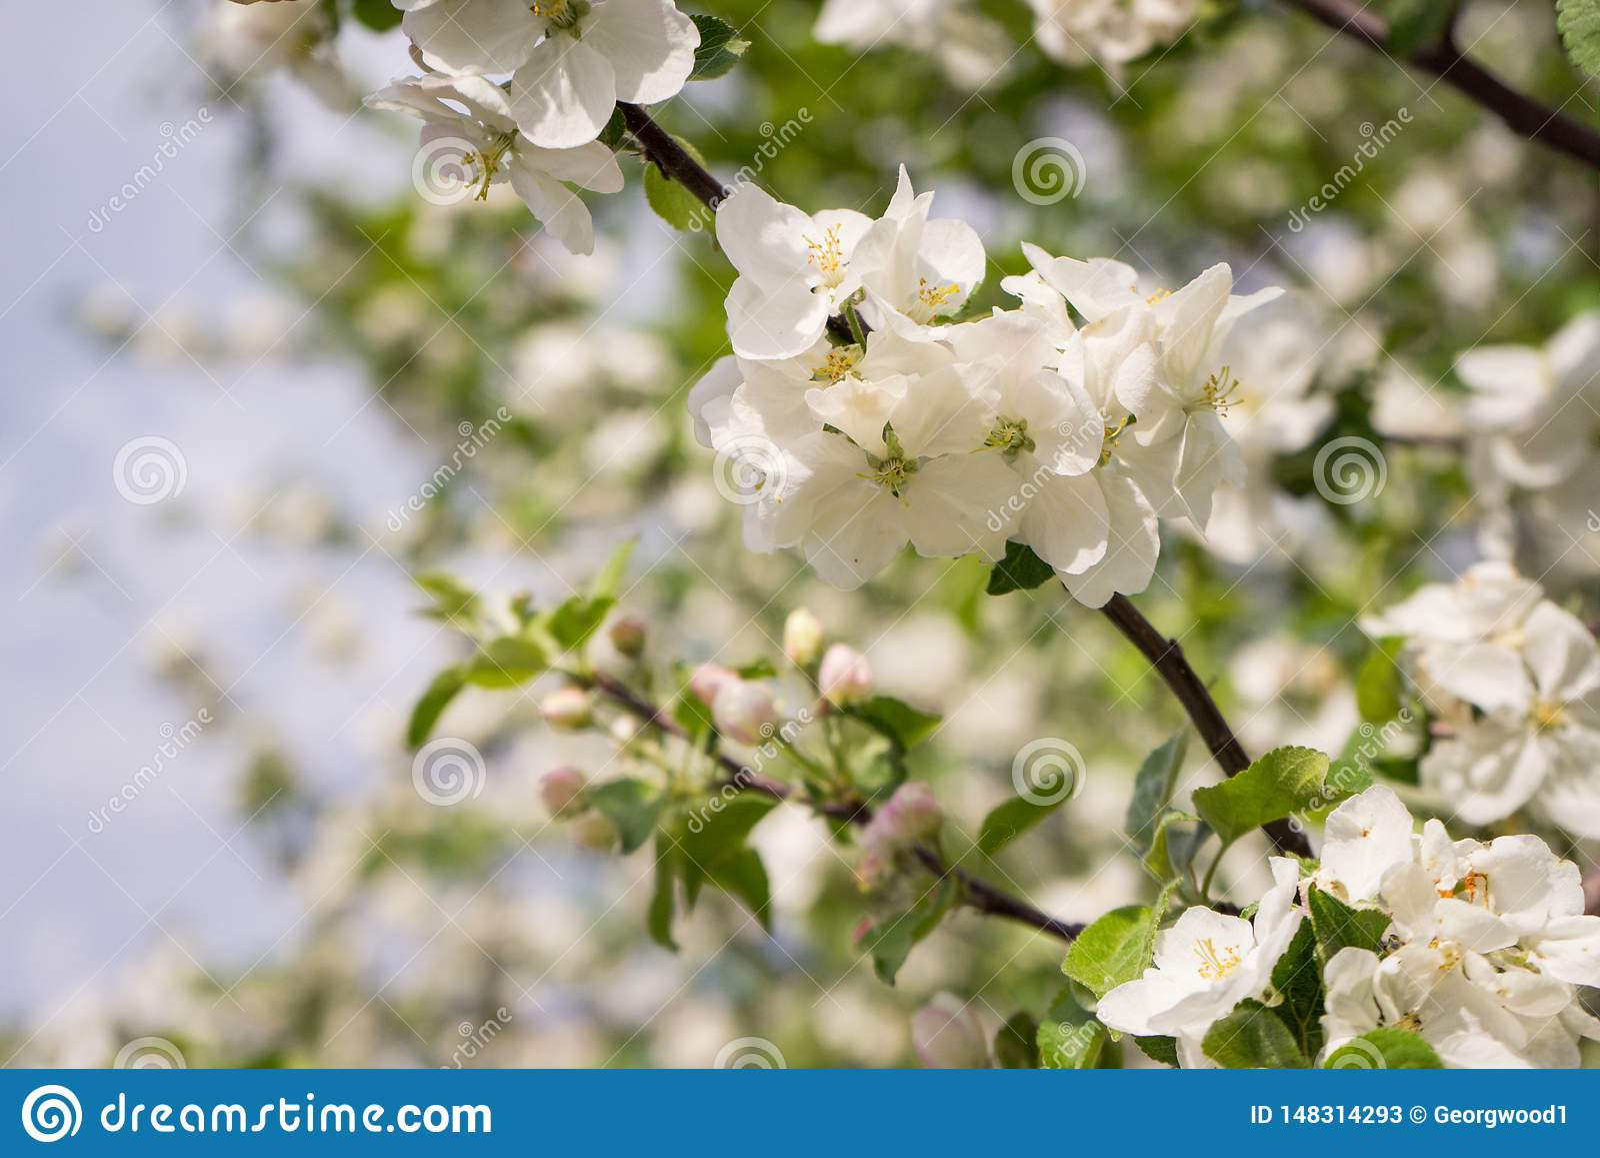 ?Las flores de Apple son hola a partir de primavera!